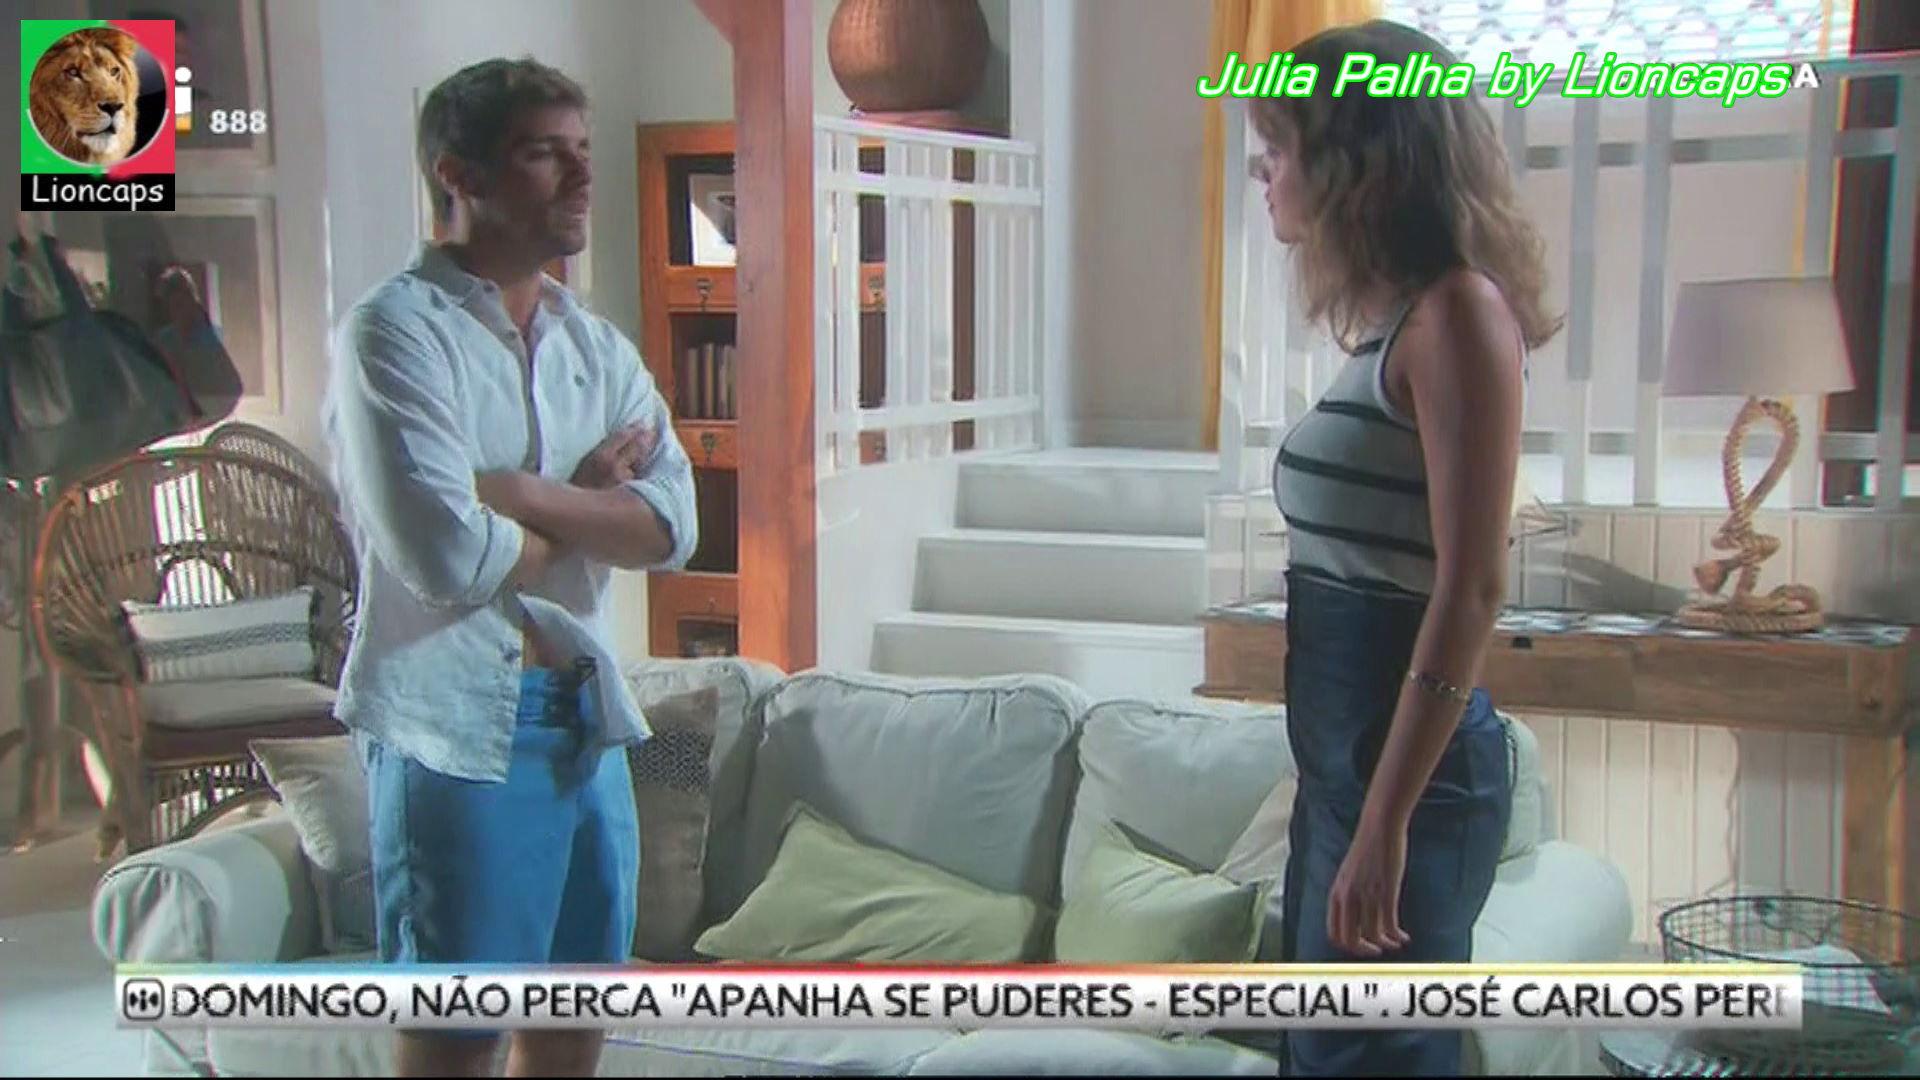 868718416_julia_palha_herdeira_vs171022_0011_122_588lo.JPG